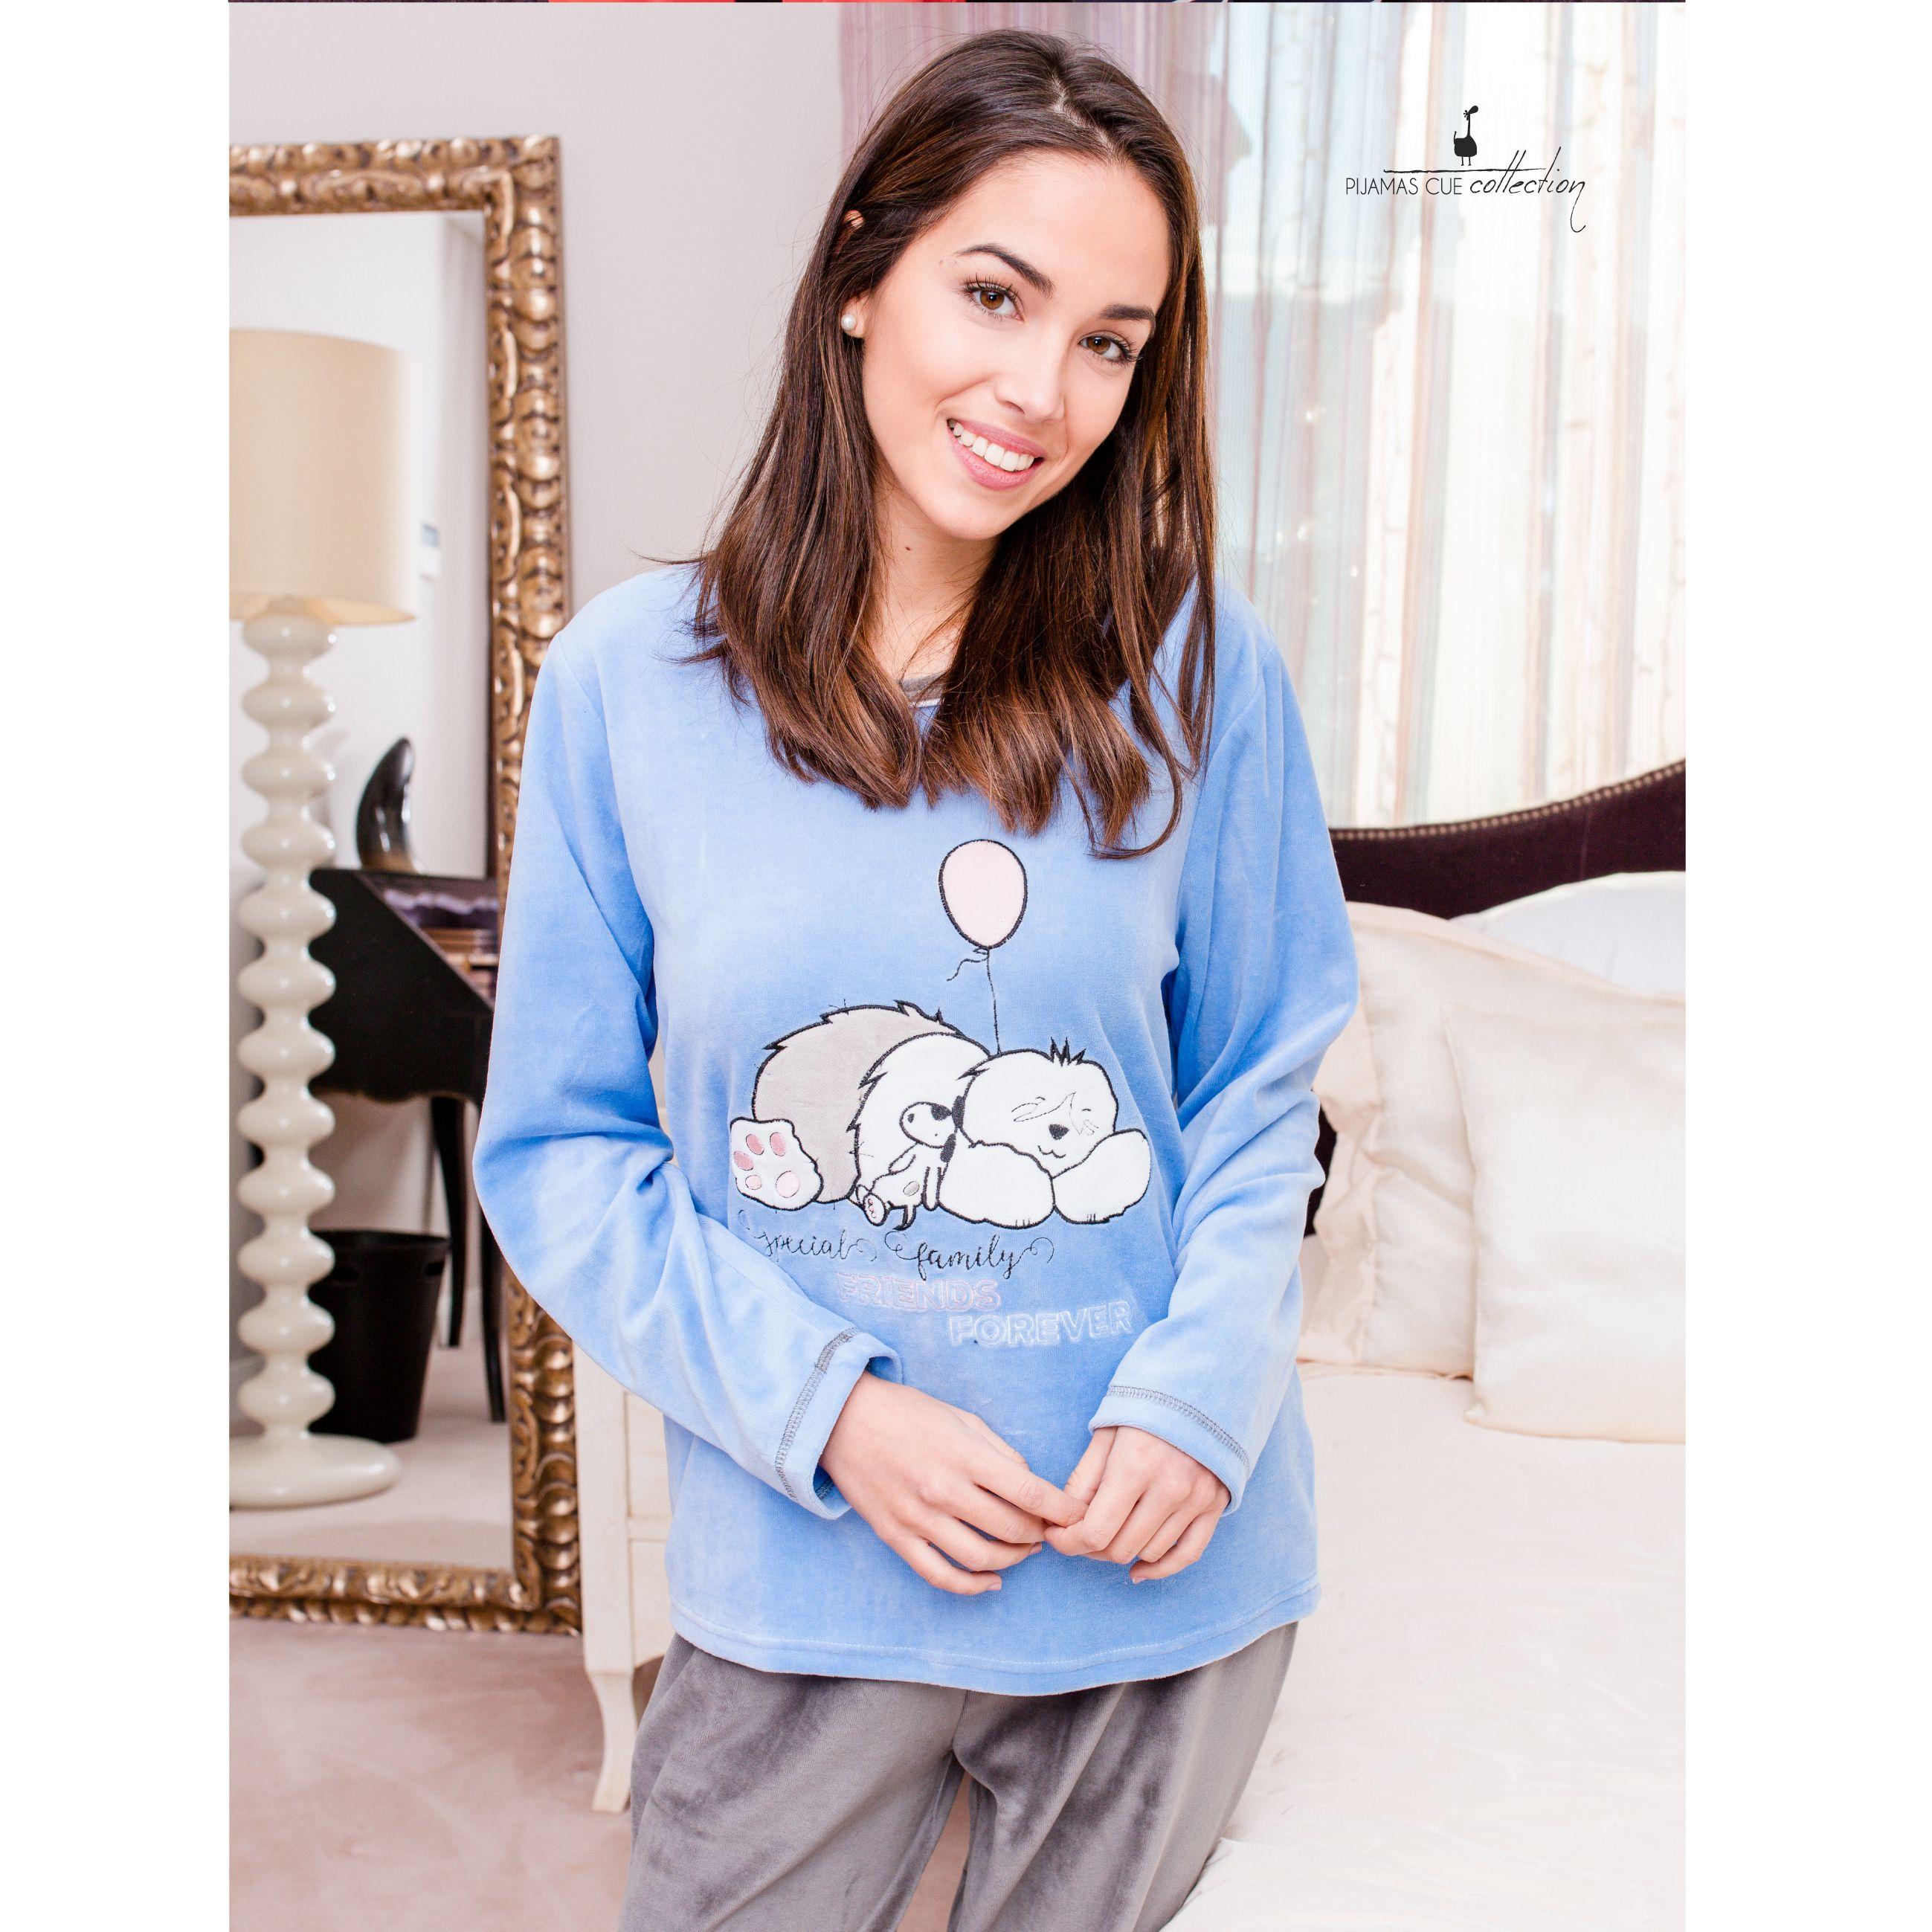 1cc82e8c8 pijama bata señora pantalon camiseta largo tundosado polar algodon robe  pajama rabbit homewear sleepwear invierno winter perro dog globo azul rosa